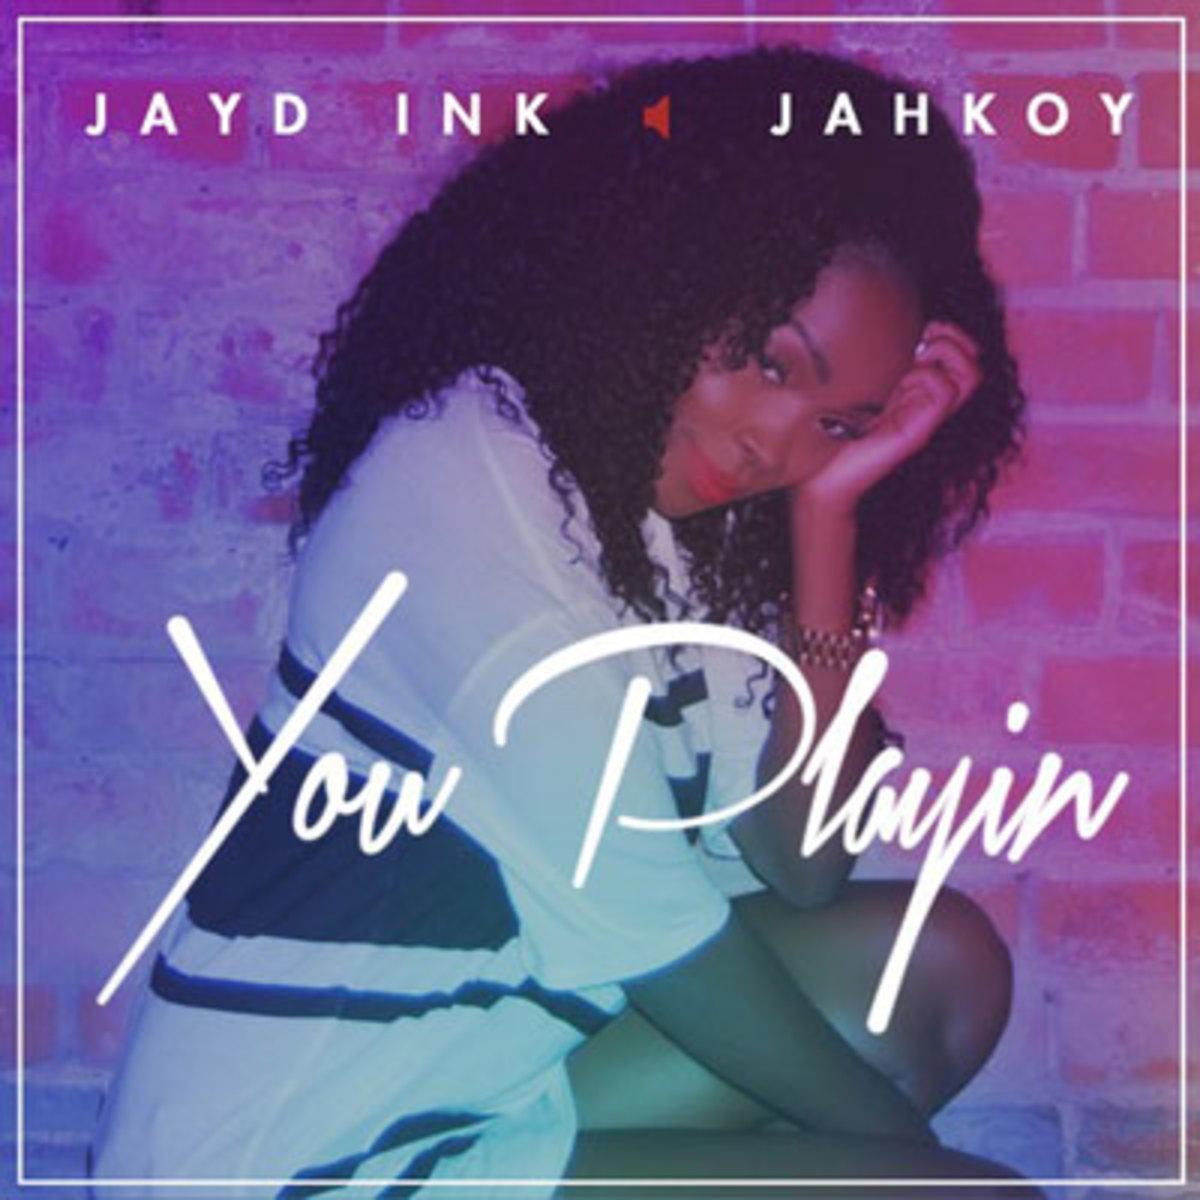 jaydink-youplayin.jpg